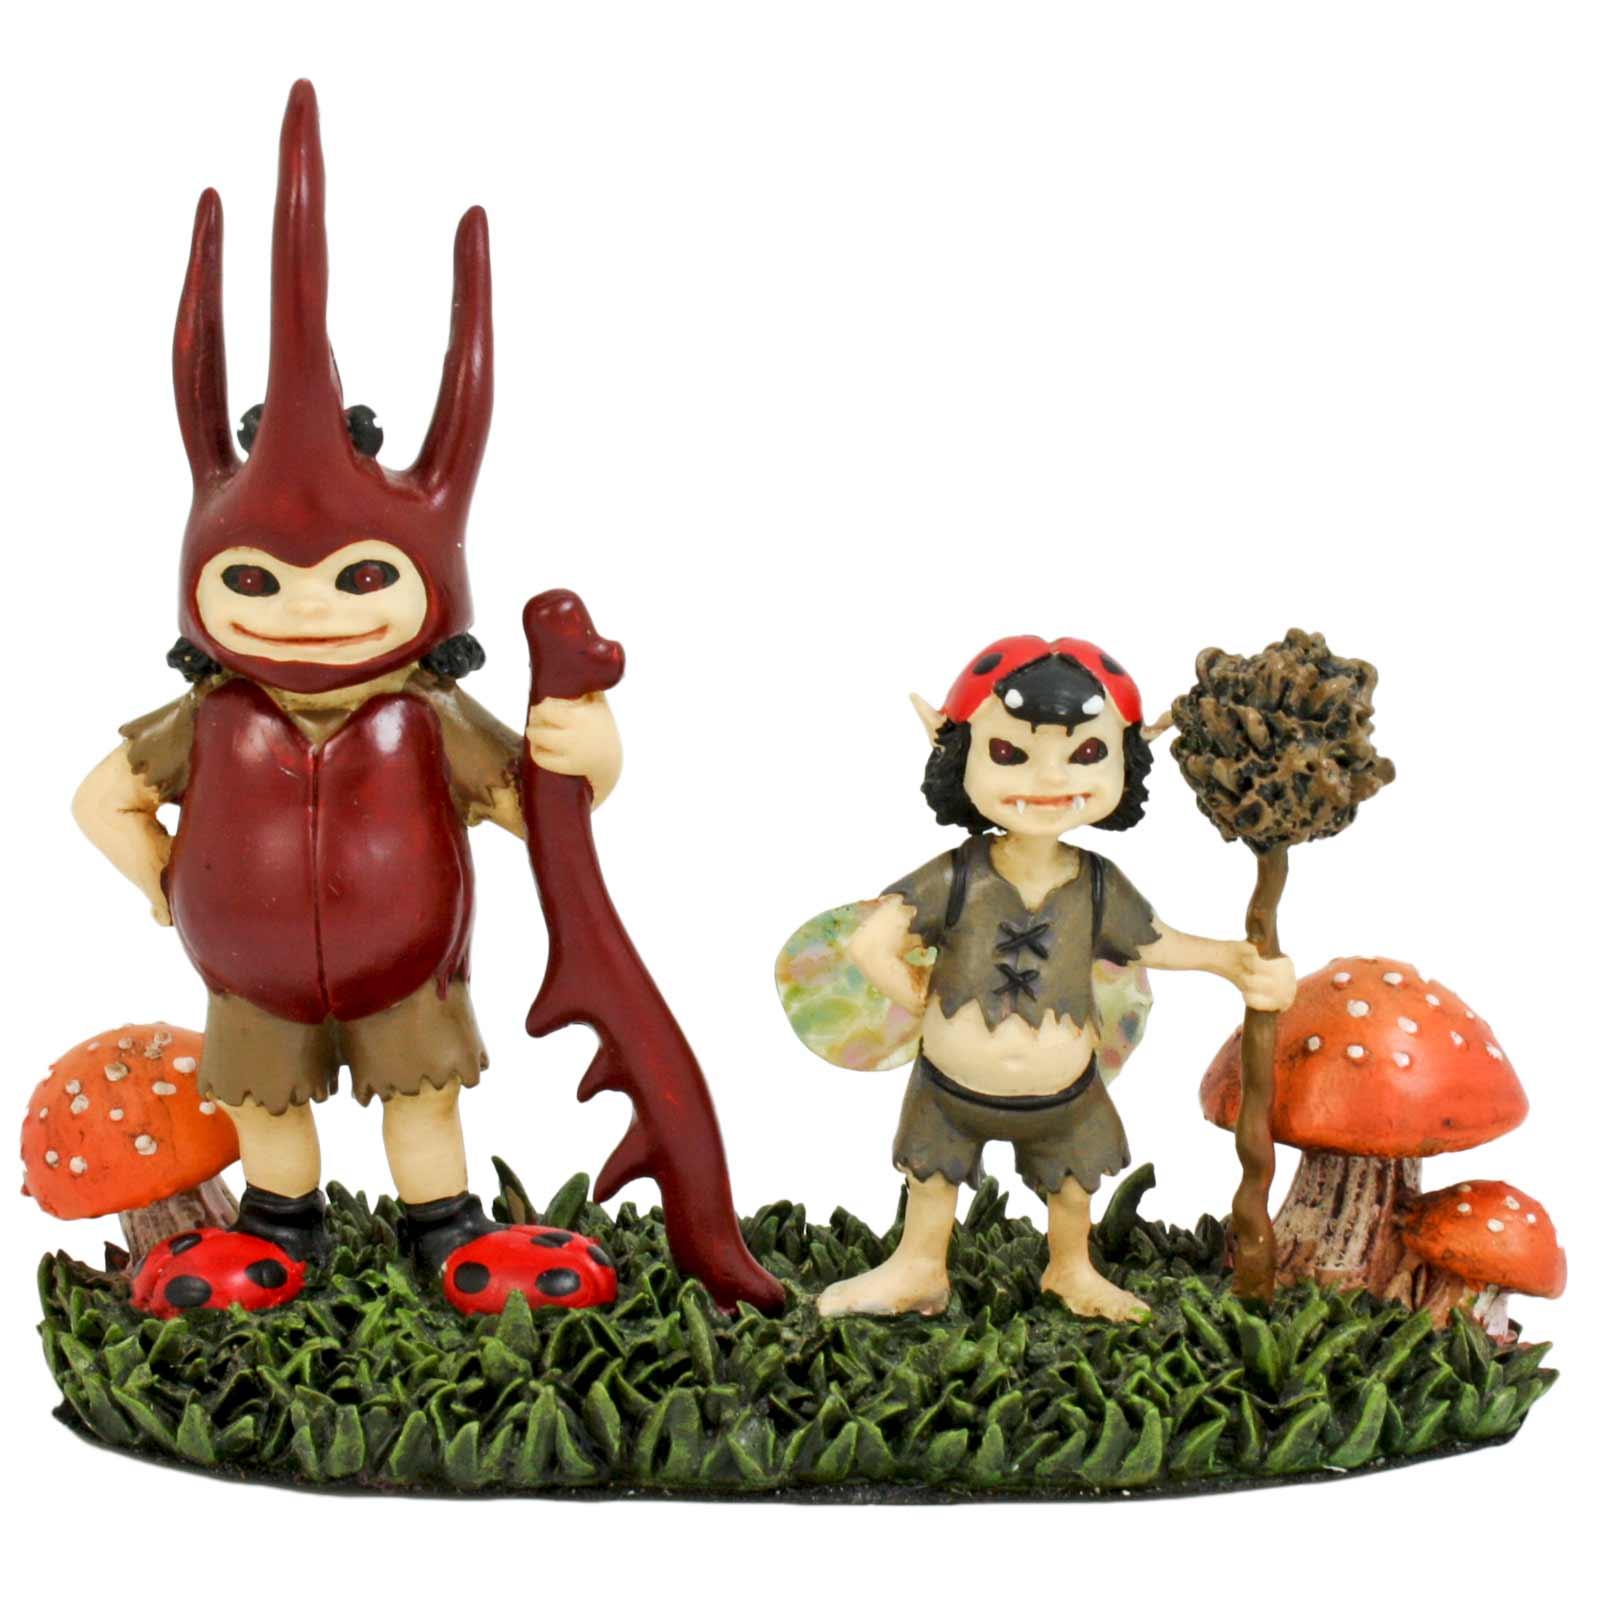 Christmas Decorations Santa Clarita Ca: Brownie Boys Fairytale Mushroom Fantasy Cute Figurine